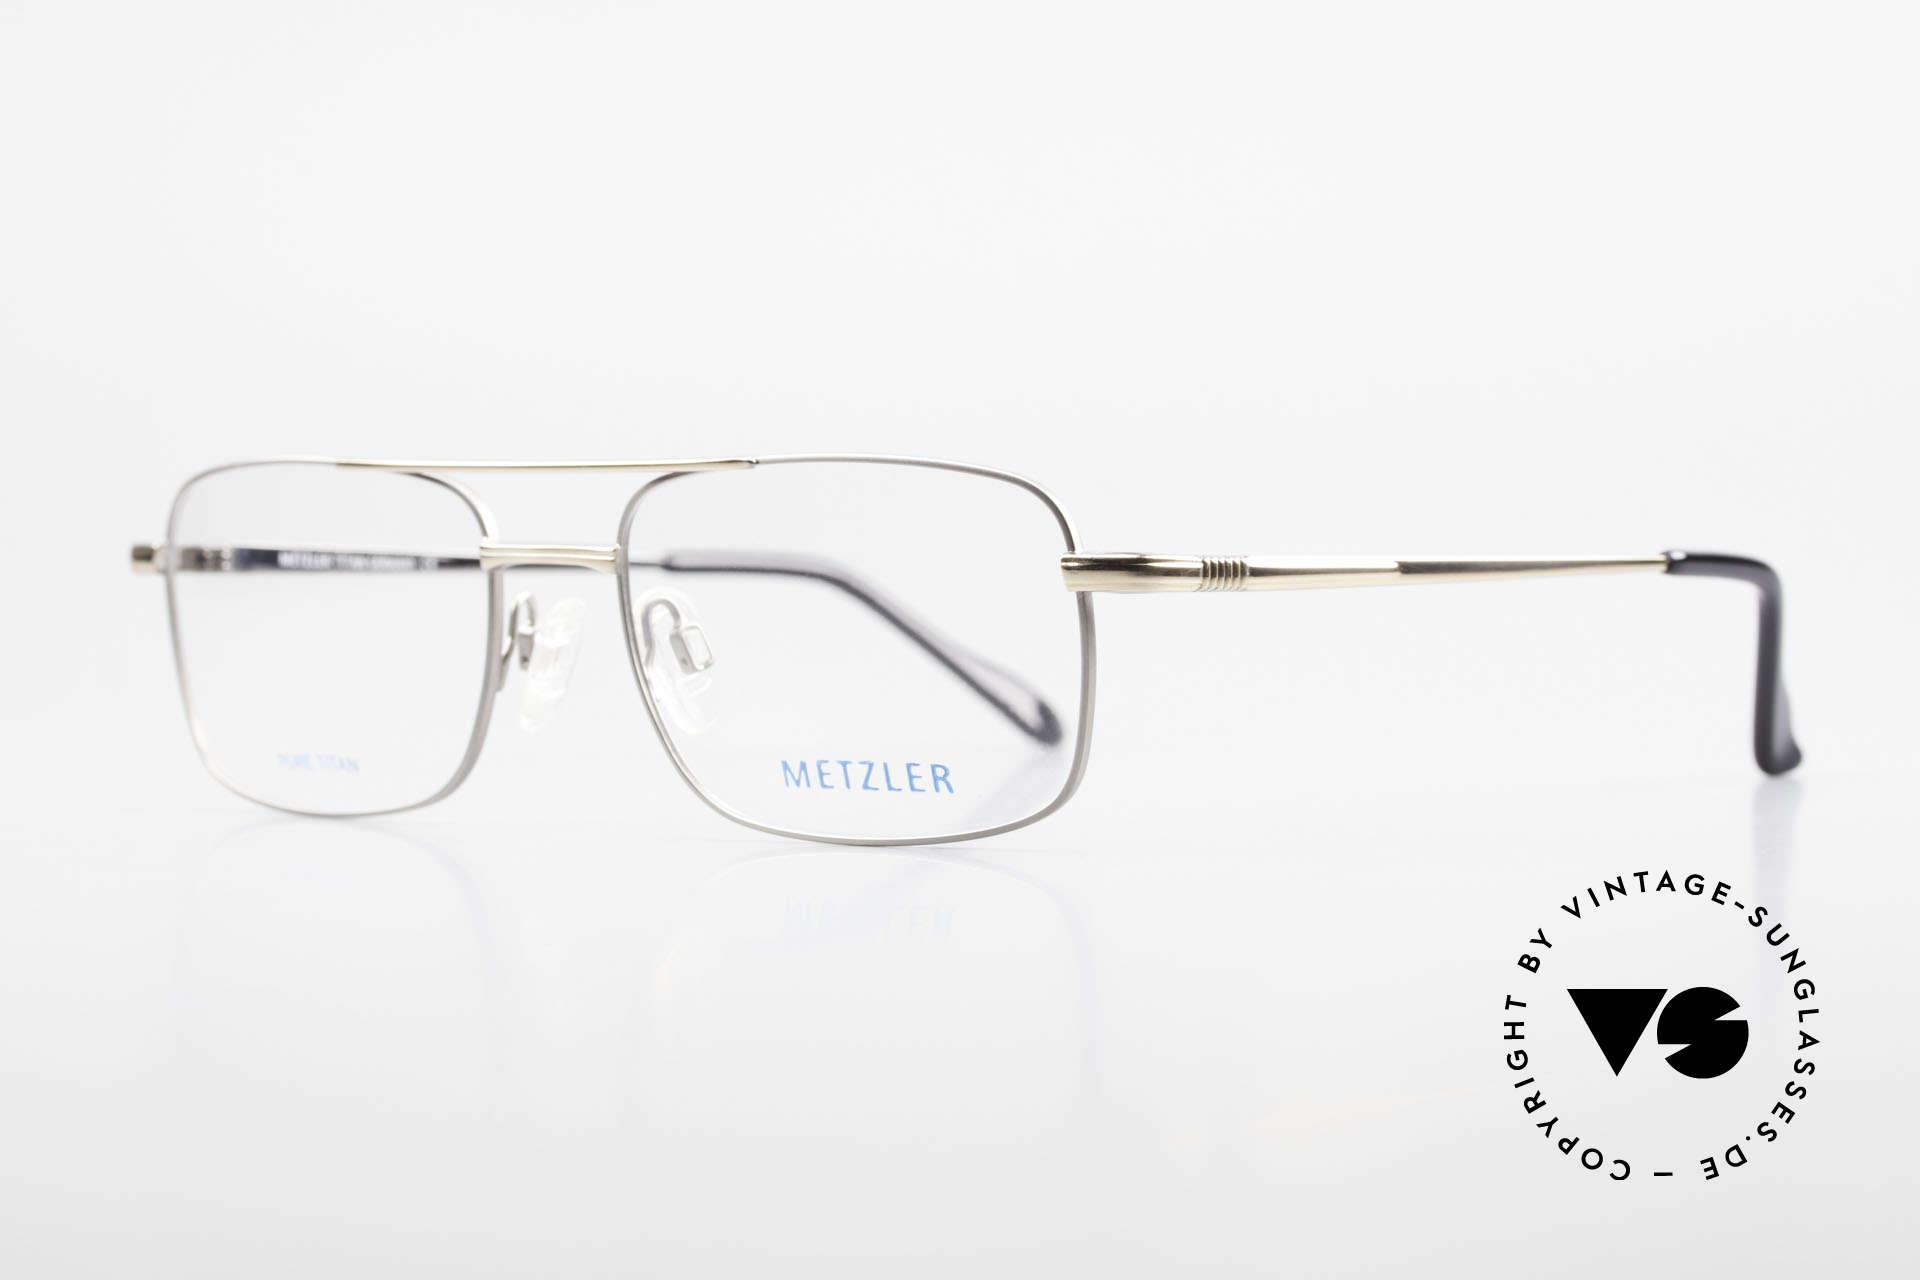 Metzler 1680 90's Titan Eyeglasses For Men, 'made in Germany' quality, PURE TITAN metal frame, Made for Men